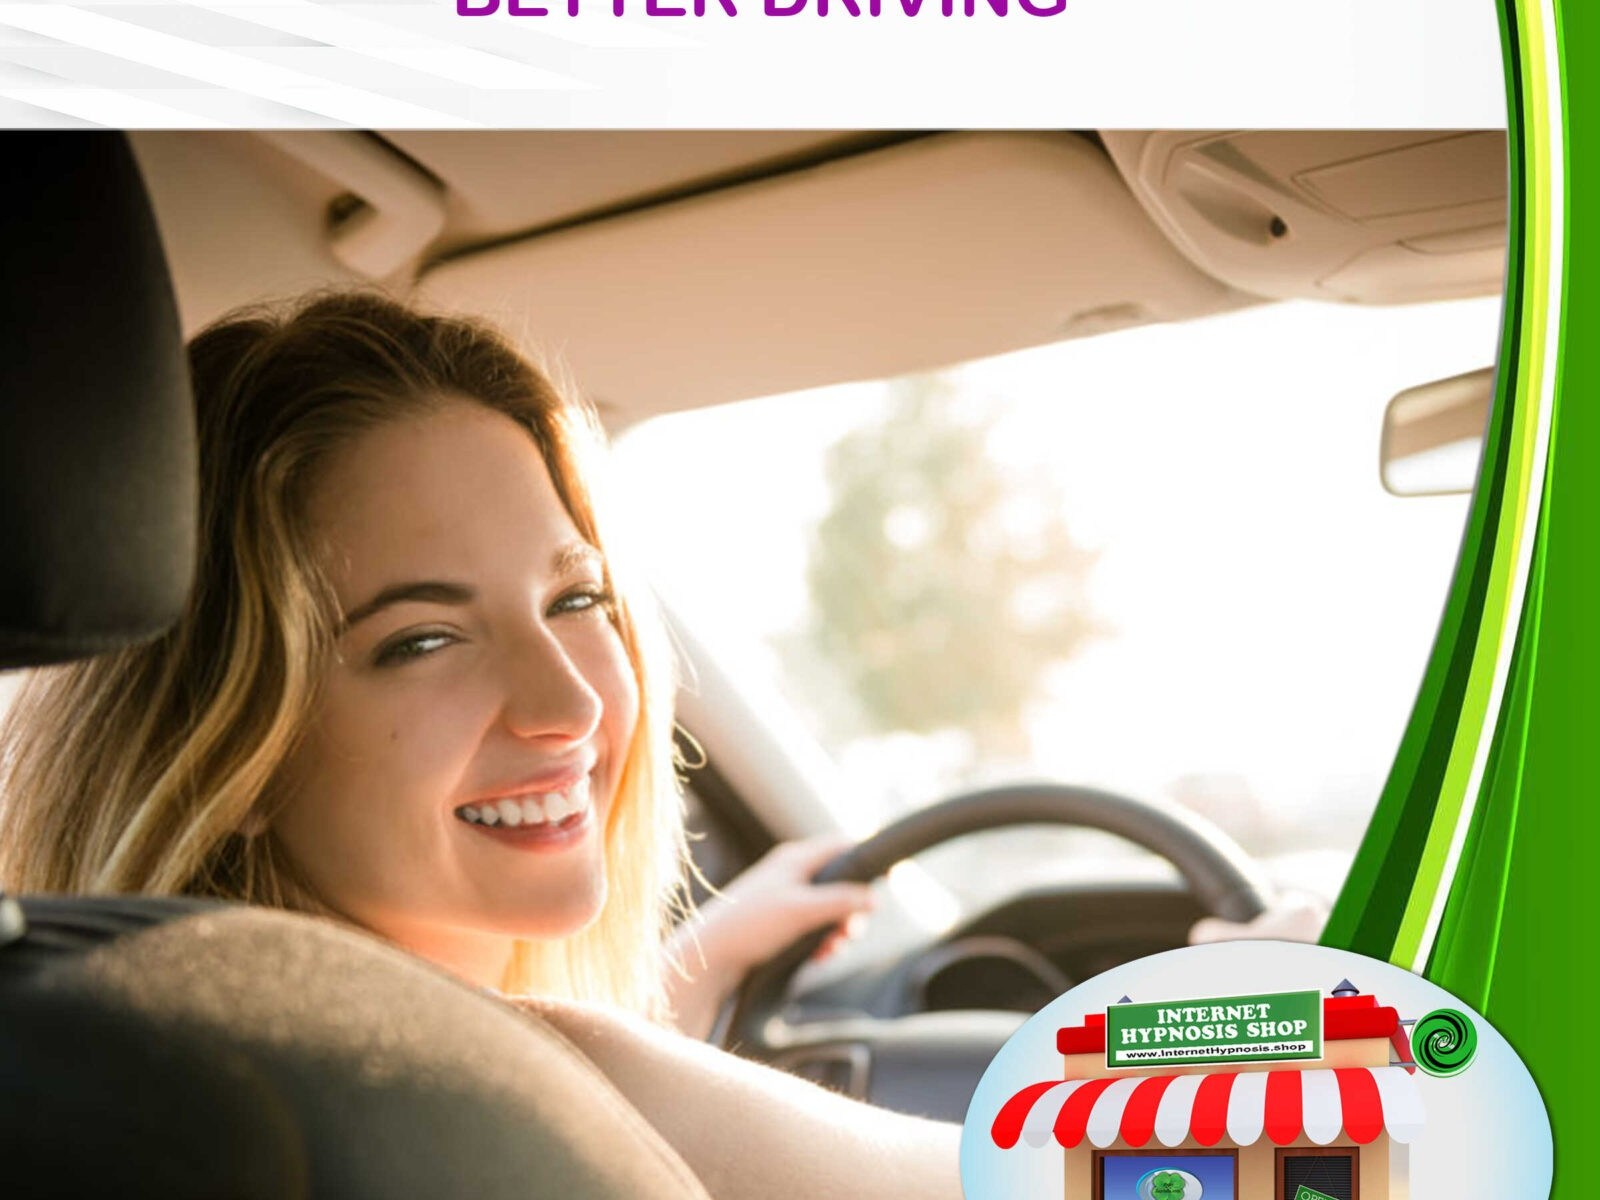 better-driving_optimized